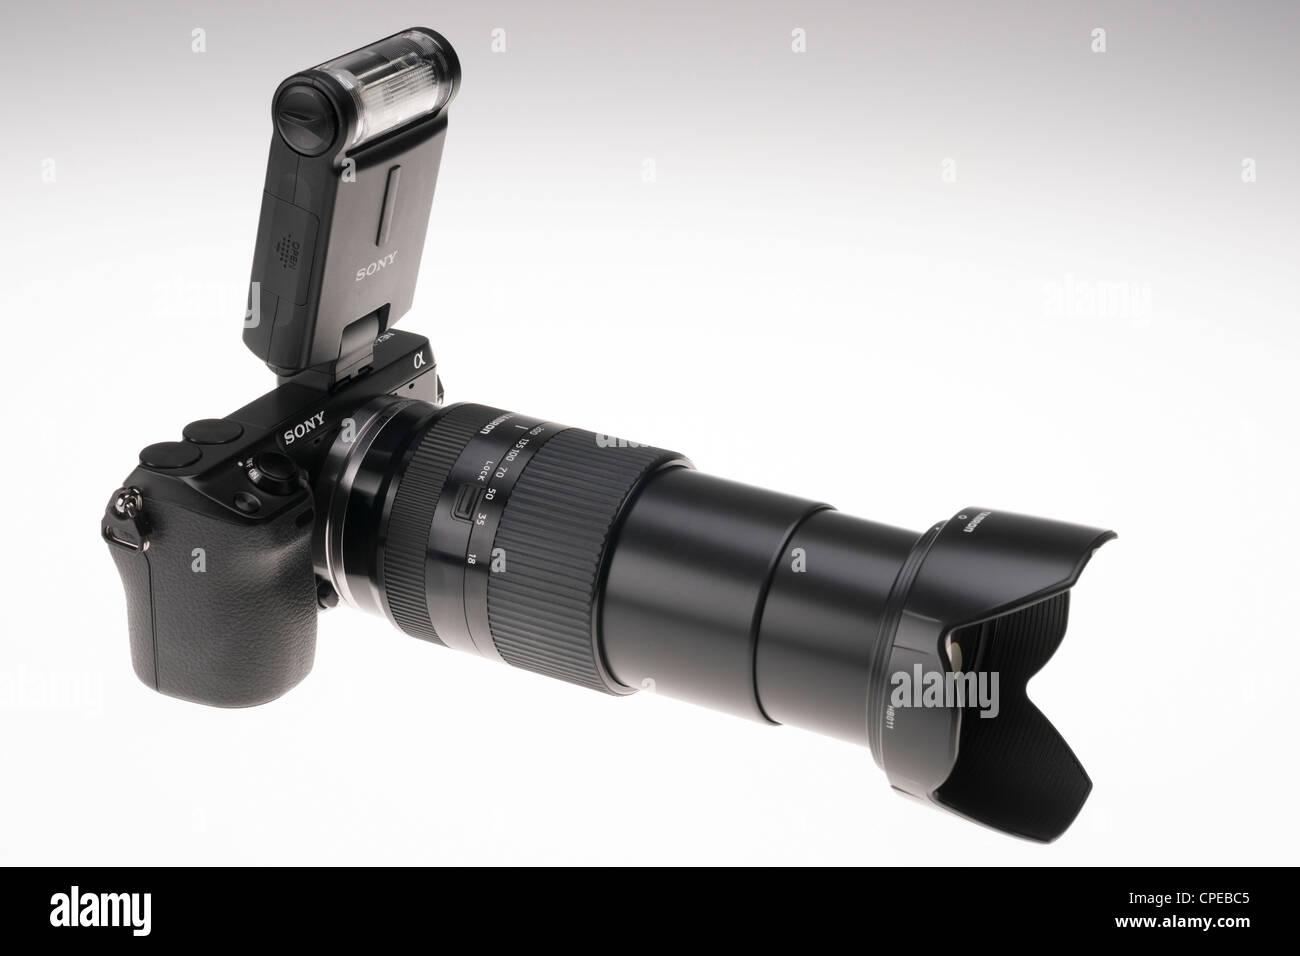 Sony NEX-7 digital mirrorless system camera with 18-200mm Tamron lens and Sony flashgun. - Stock Image